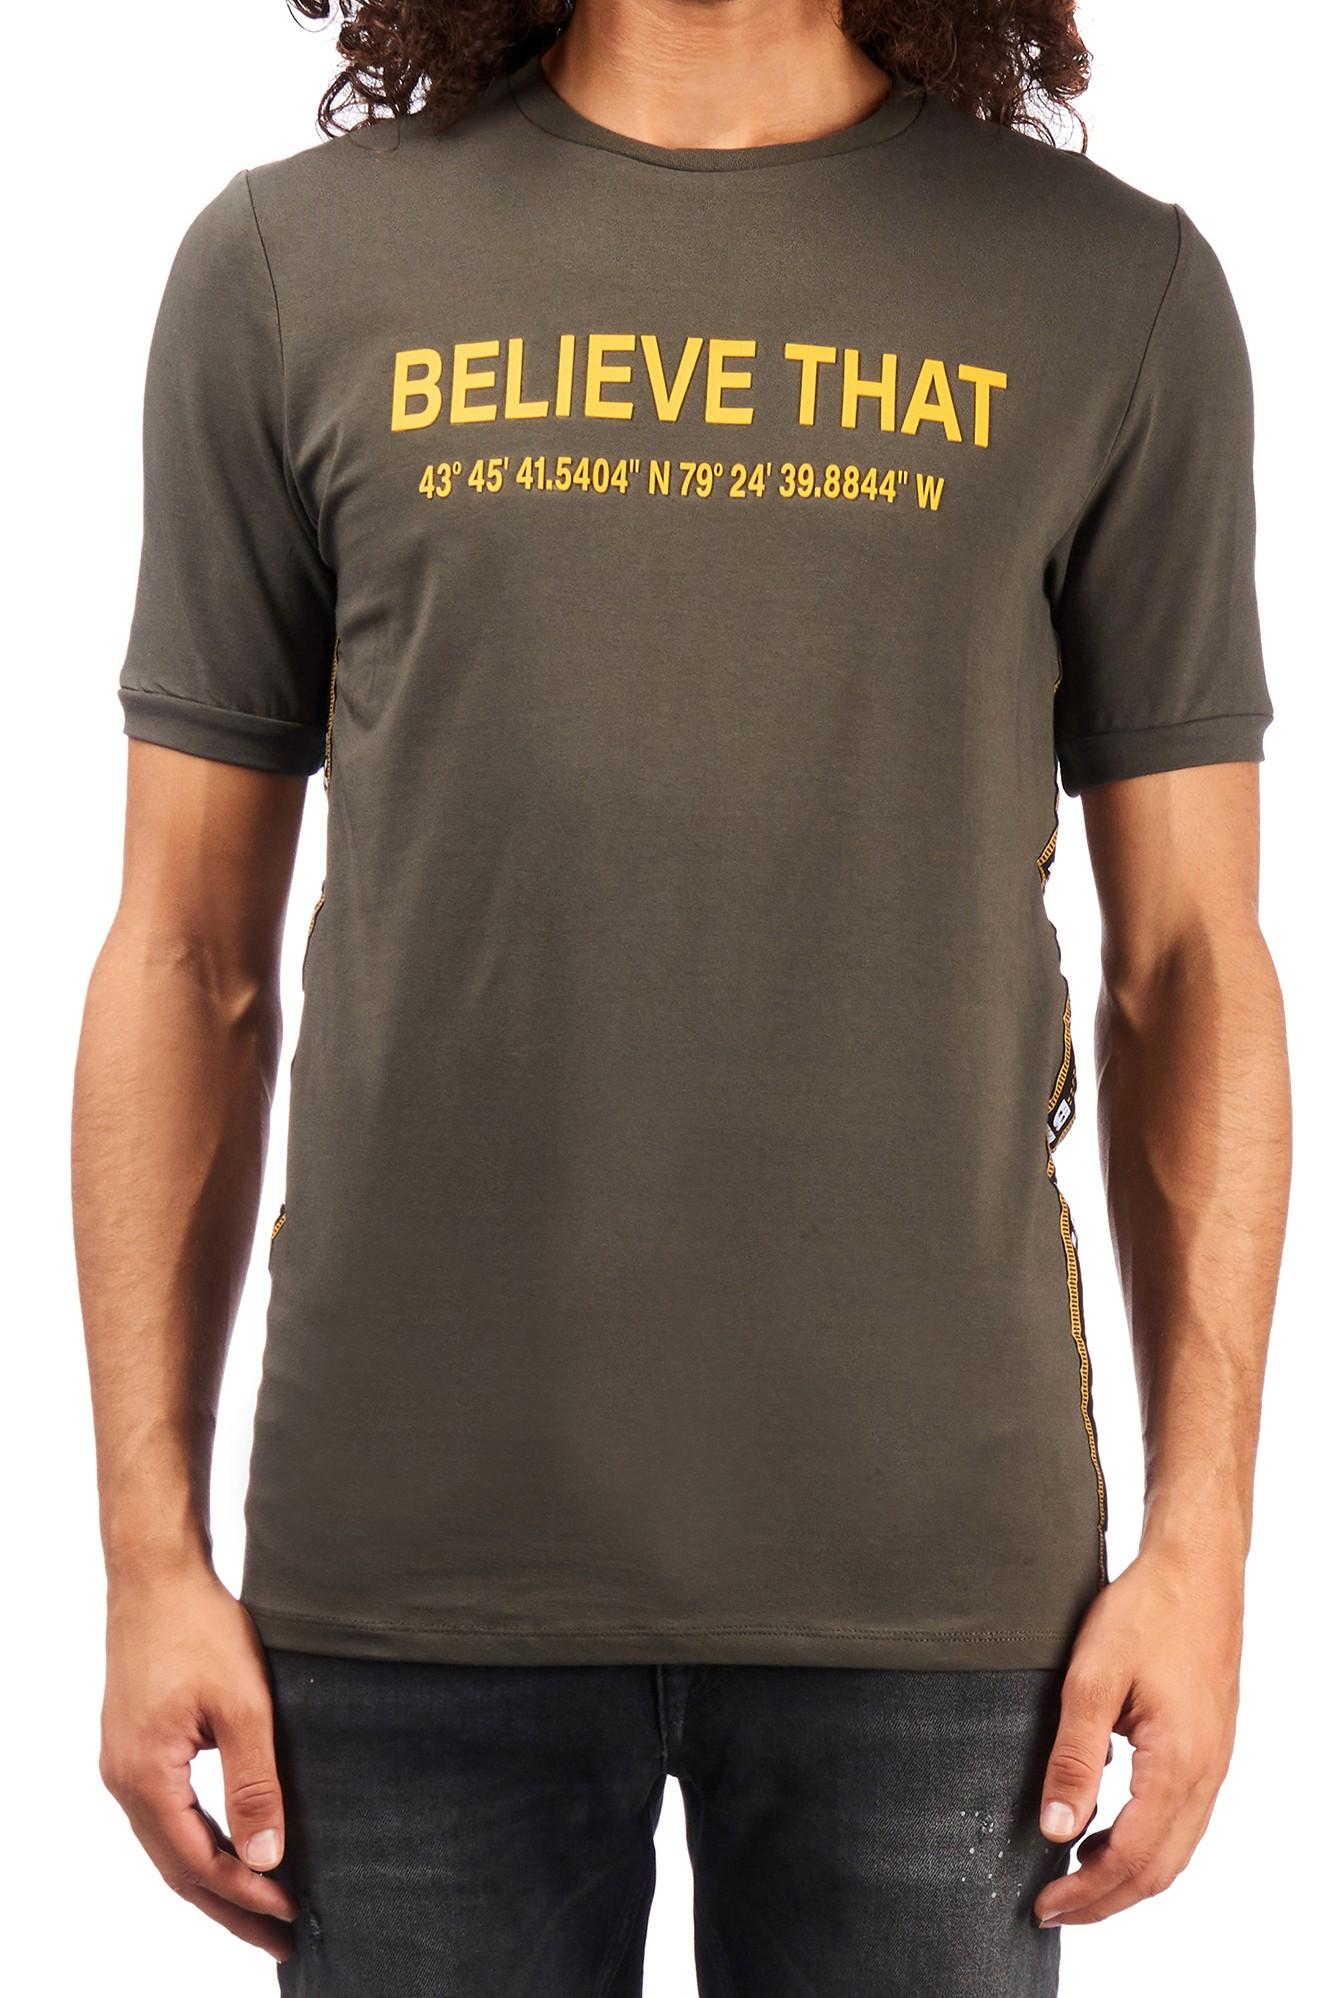 Afbeelding van Believe That Control t-shirt – groen army